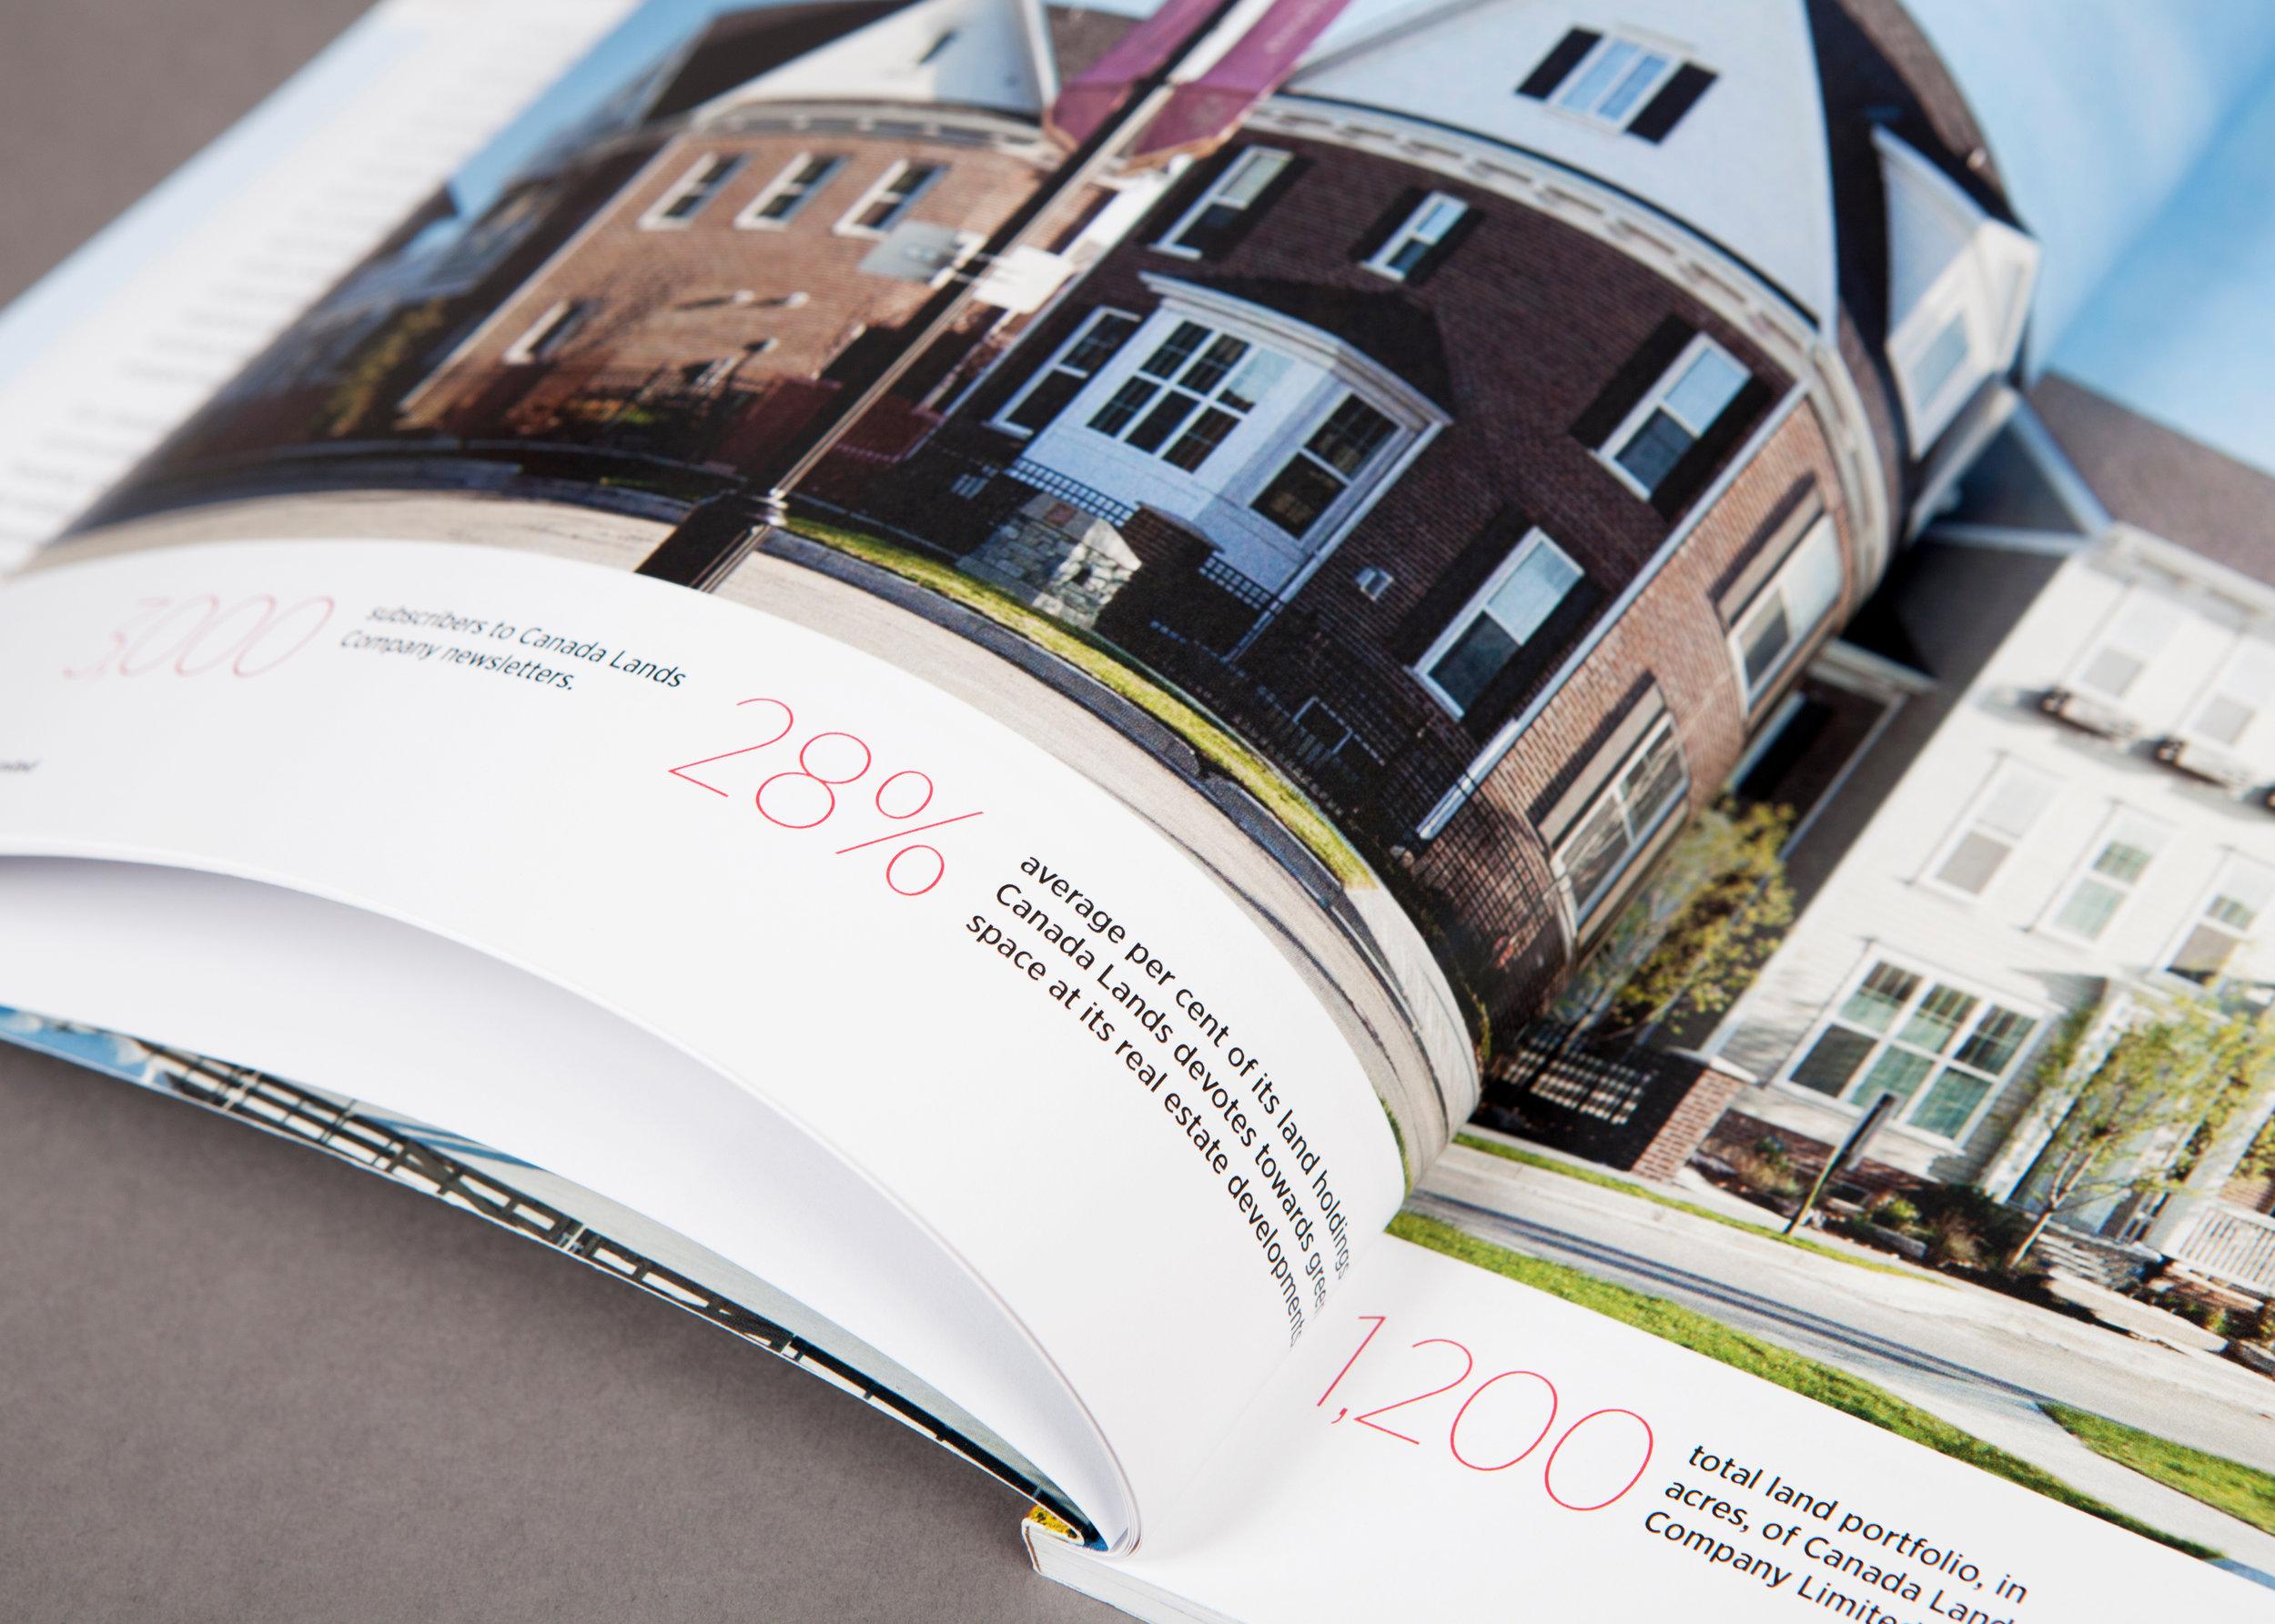 canada-lands-corporation-annual-report-3-sputnik-design-partners-toronto.jpg